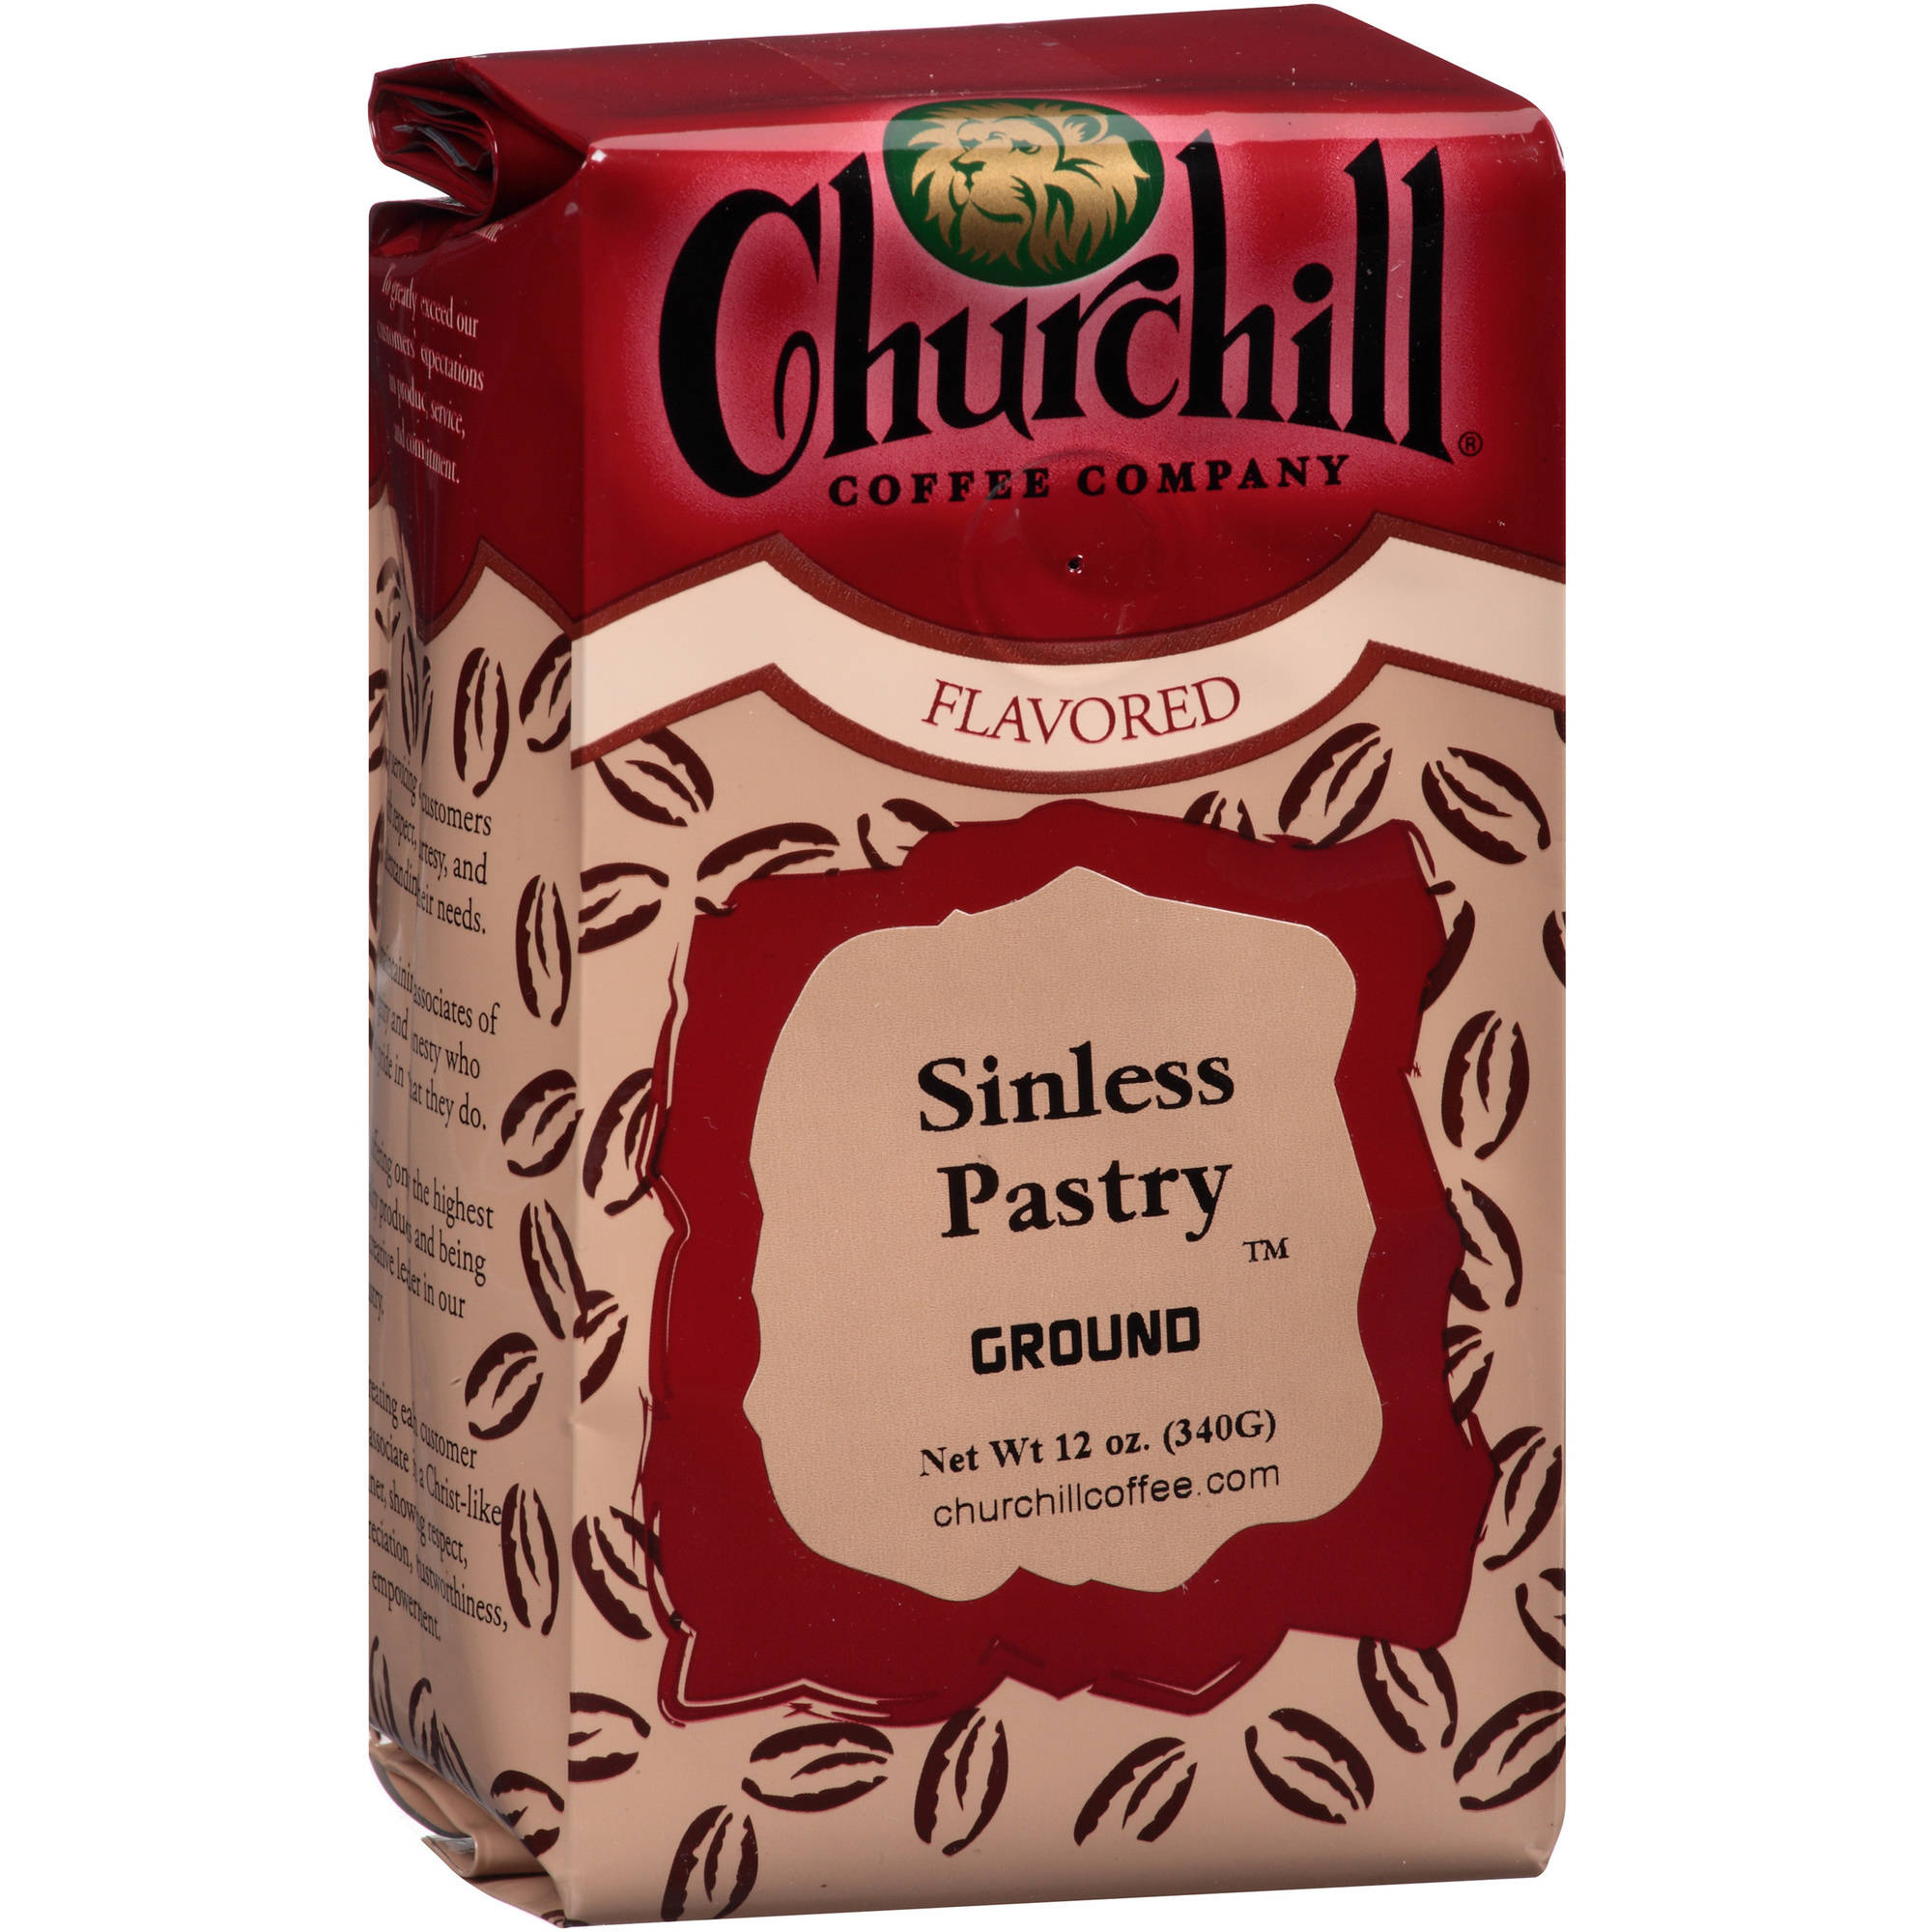 Churchill Coffee Company Sinless Pastry Cream Ground Coffee, 12 oz